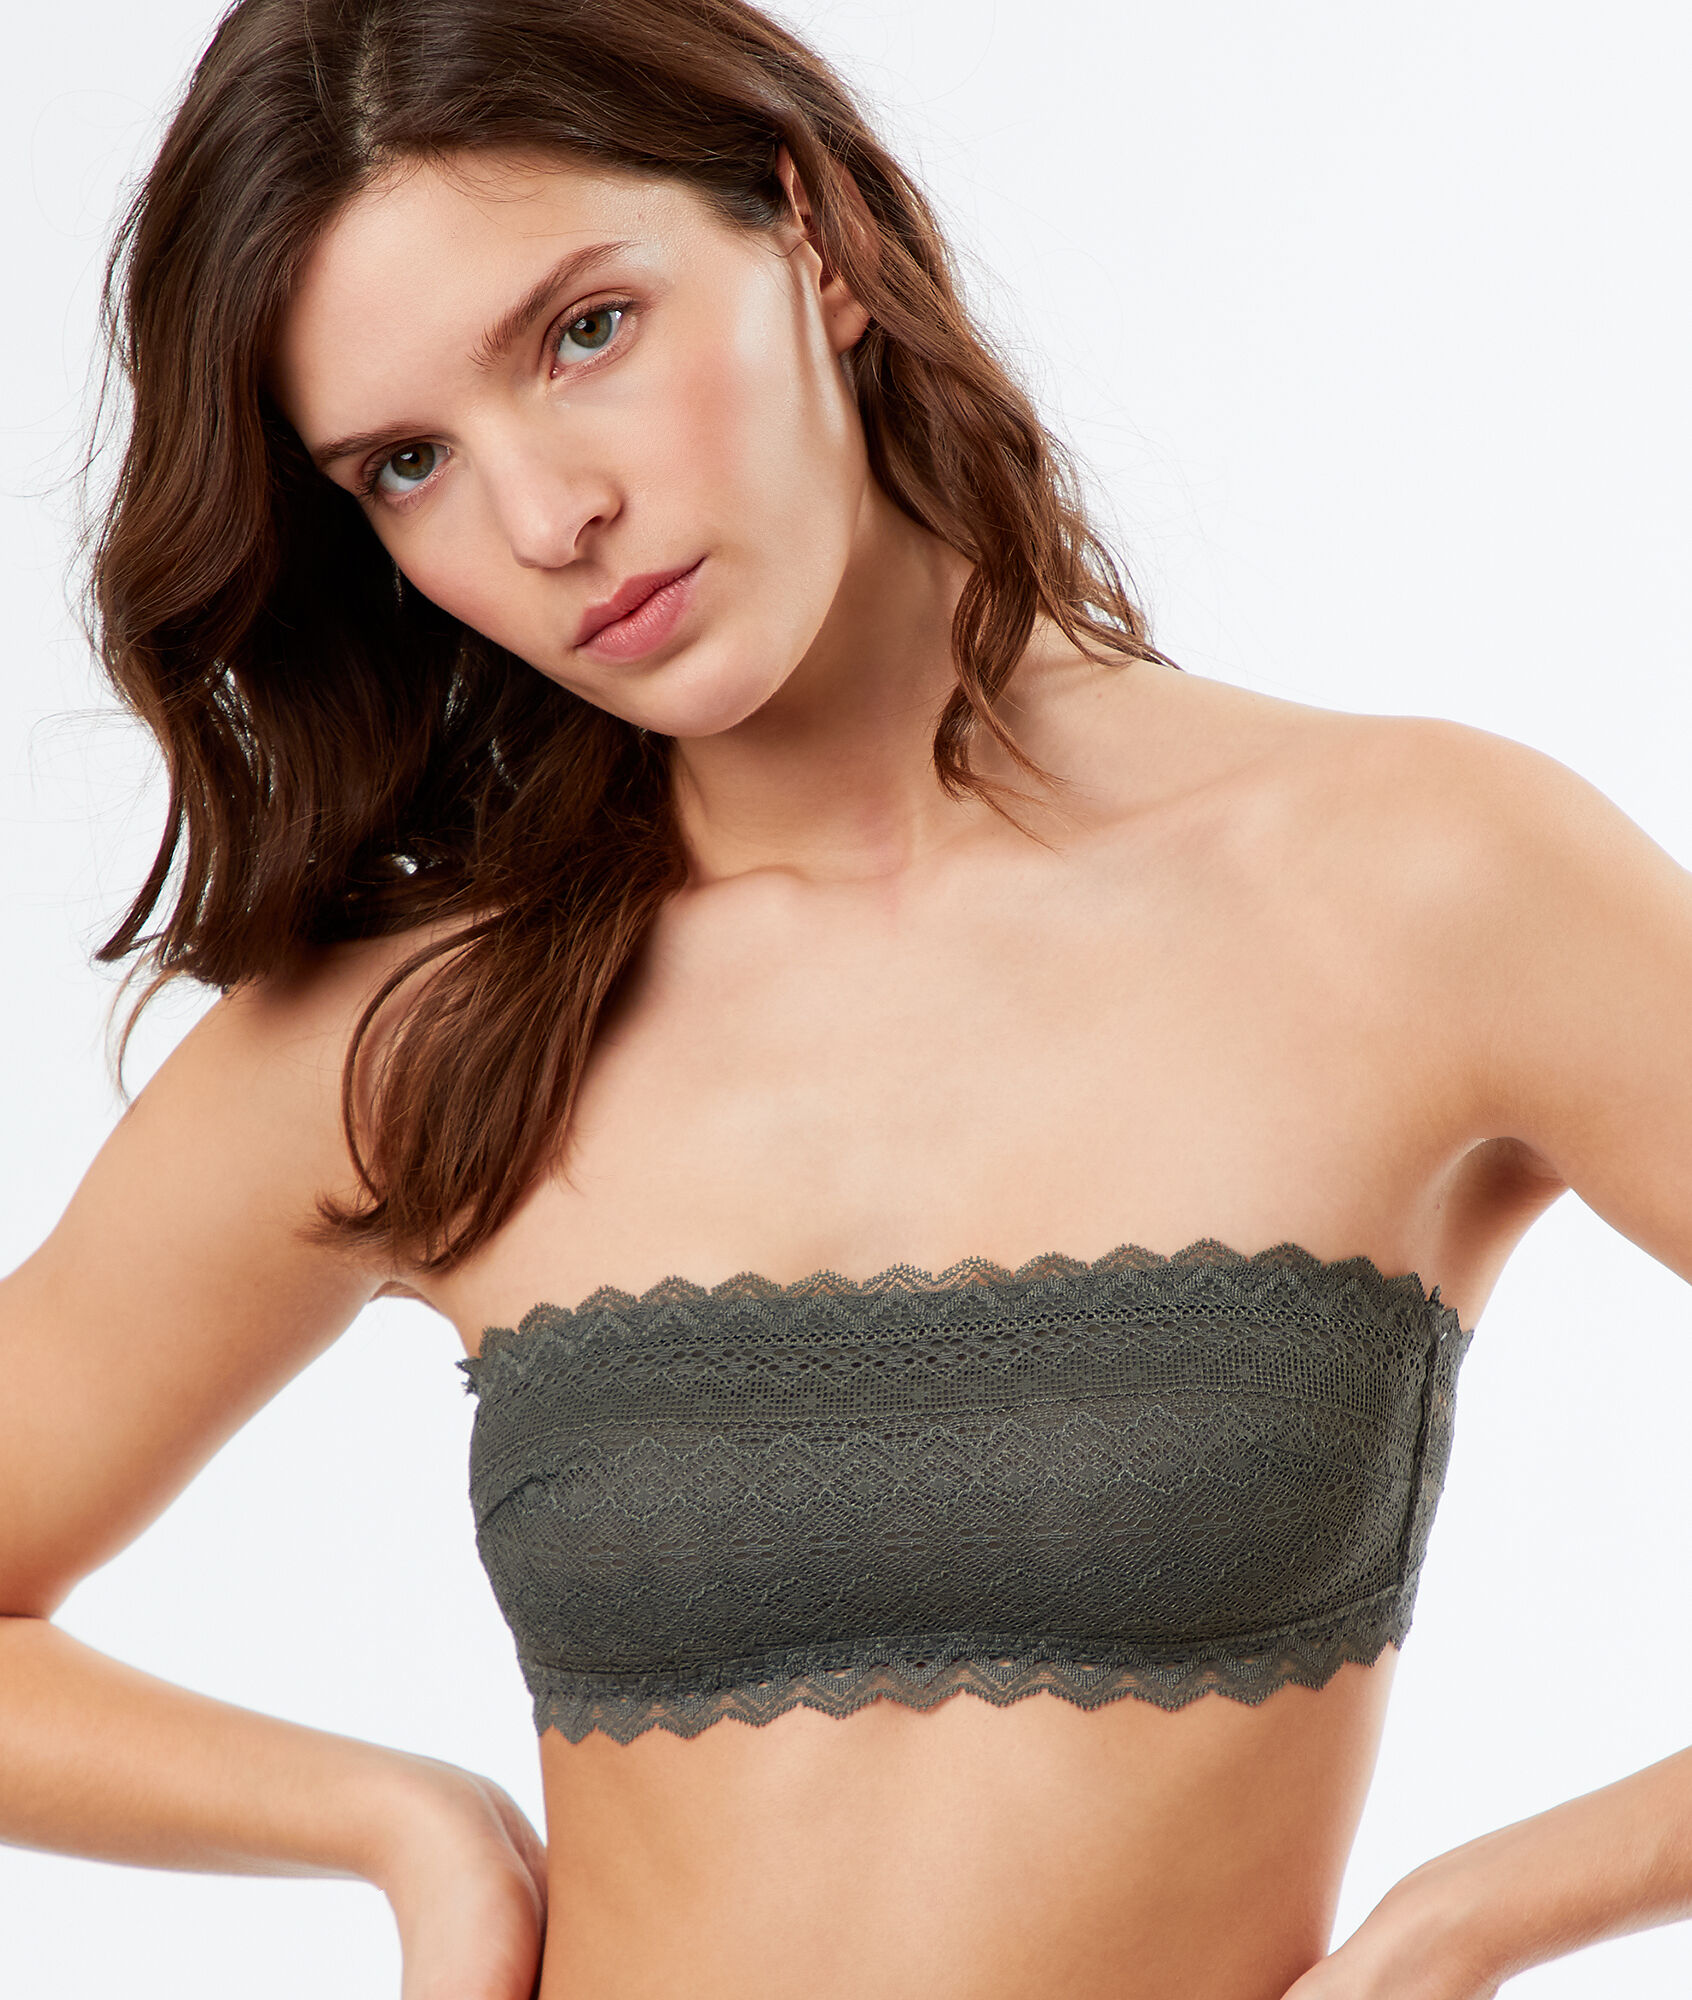 4cff59cb6852 Lace strapless bra - ICONE - KHAKI - Etam